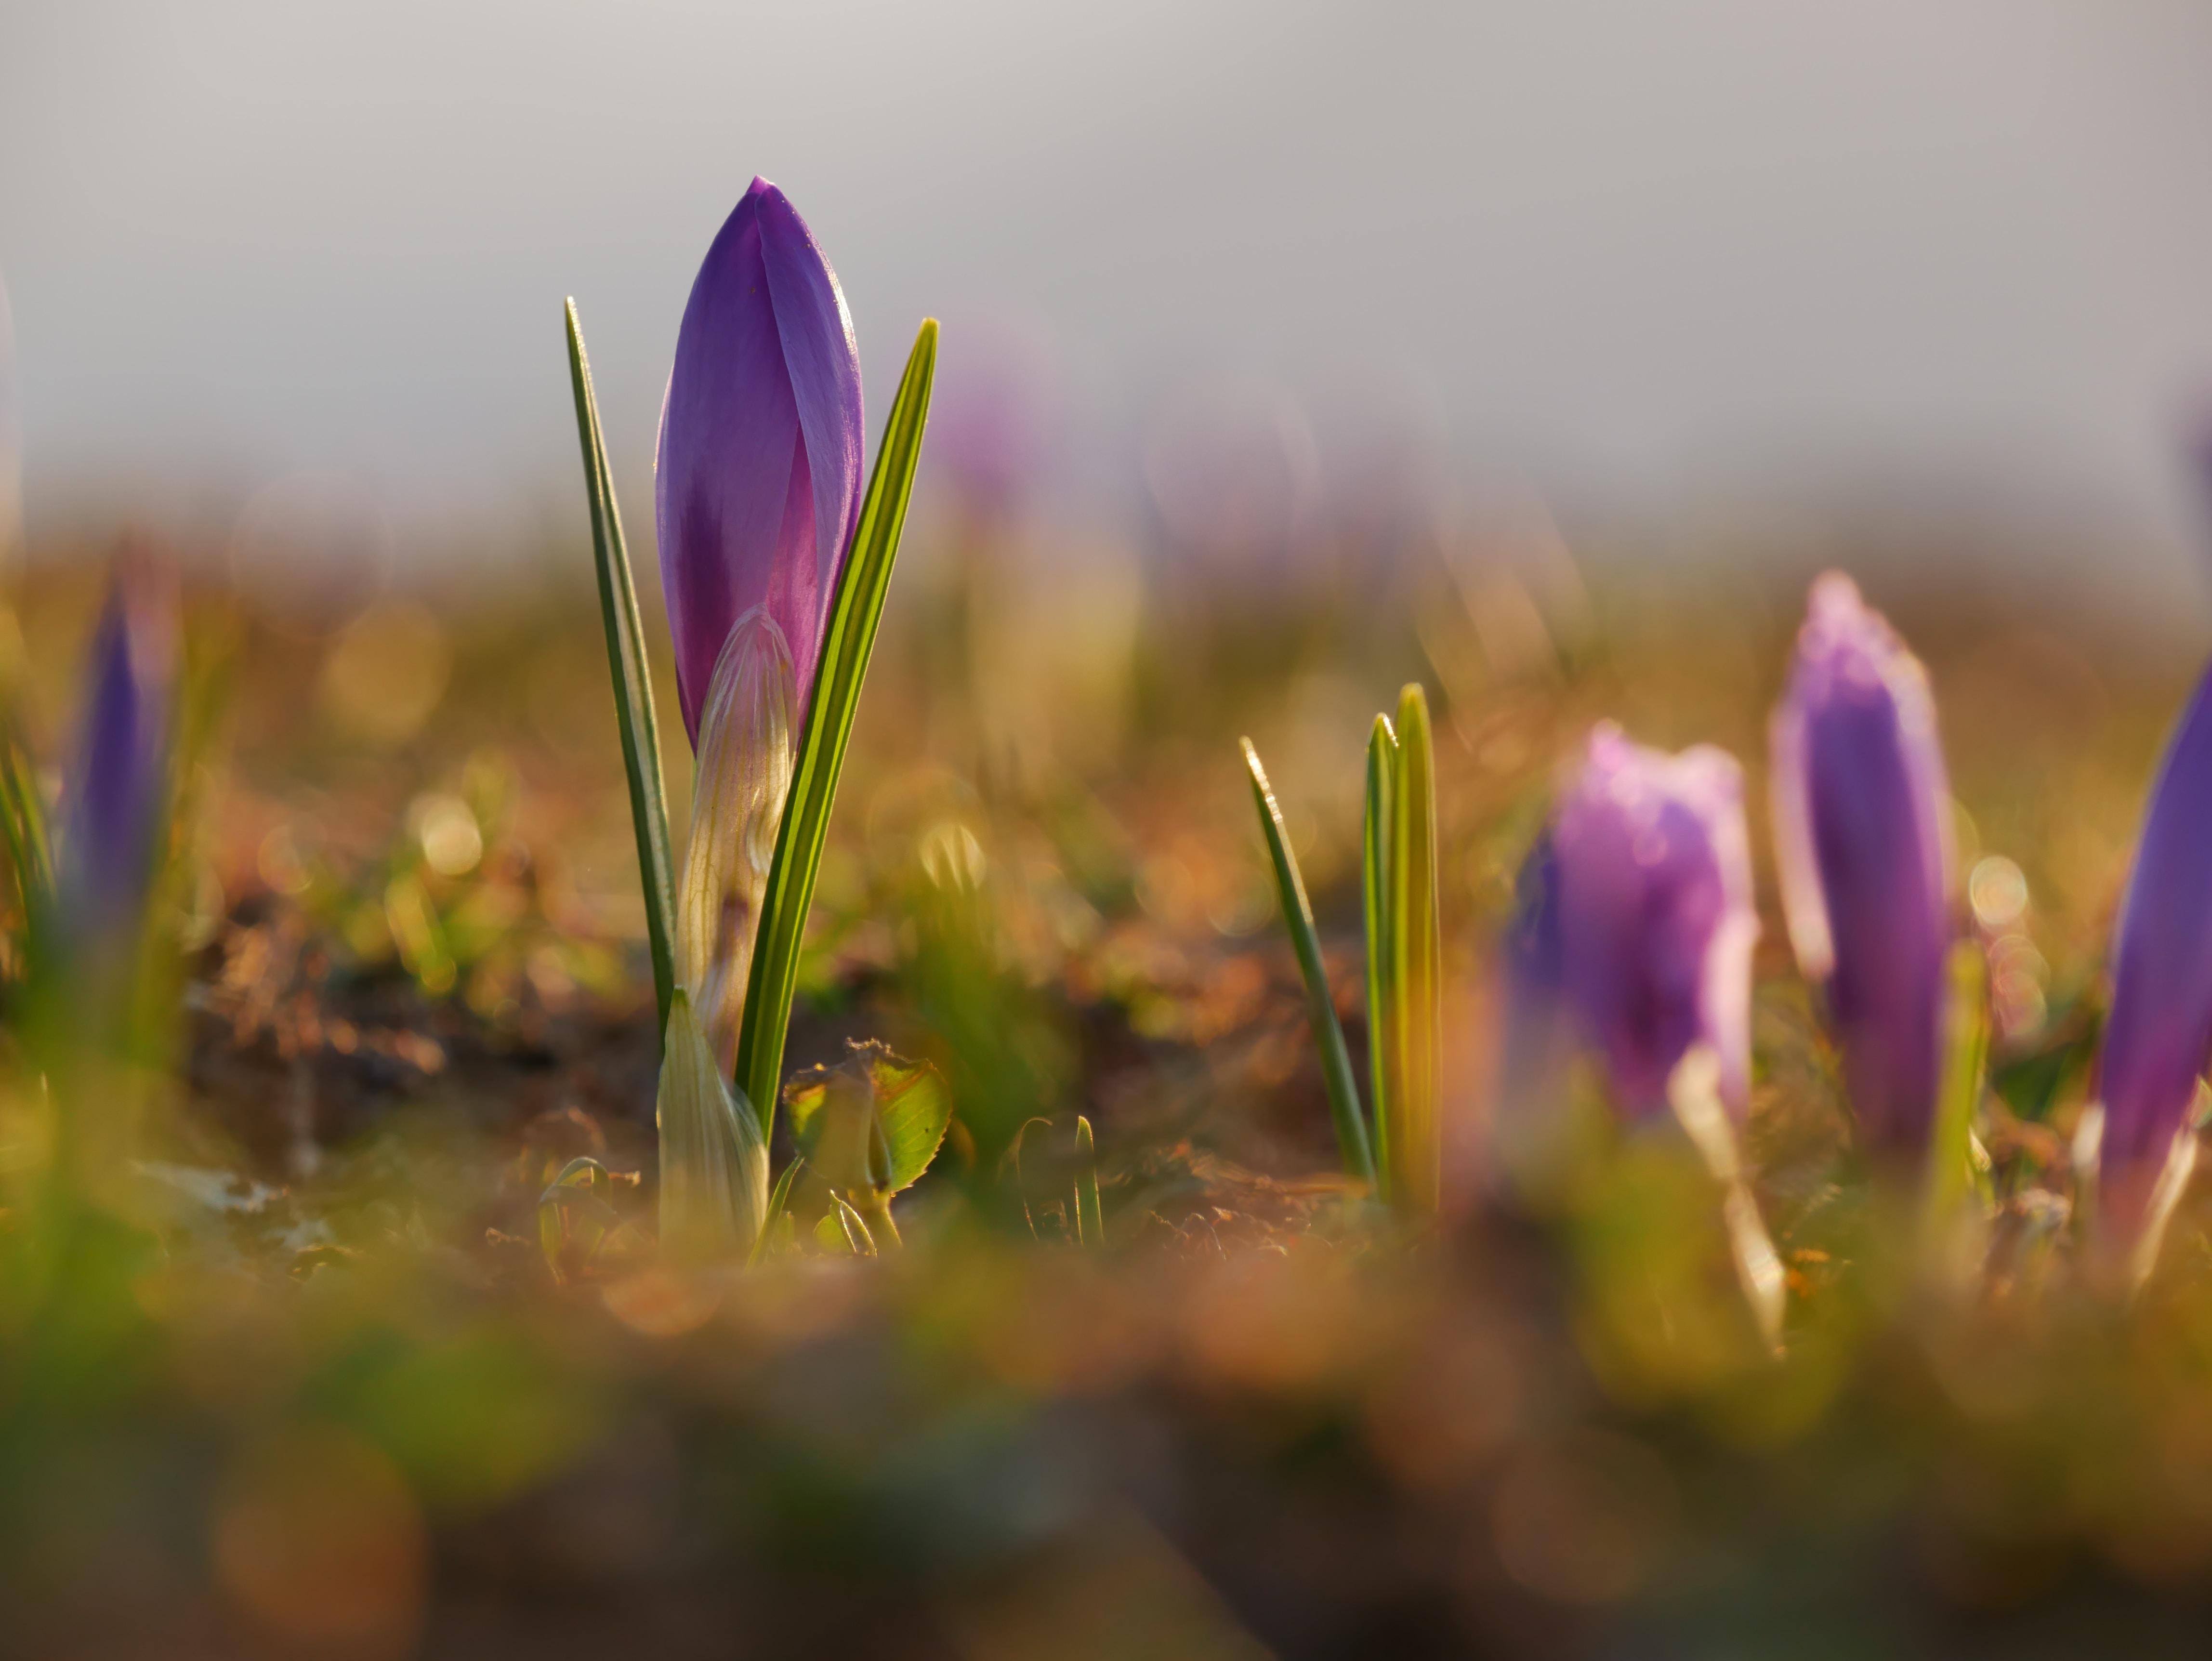 closeup photo of purple tulip flower